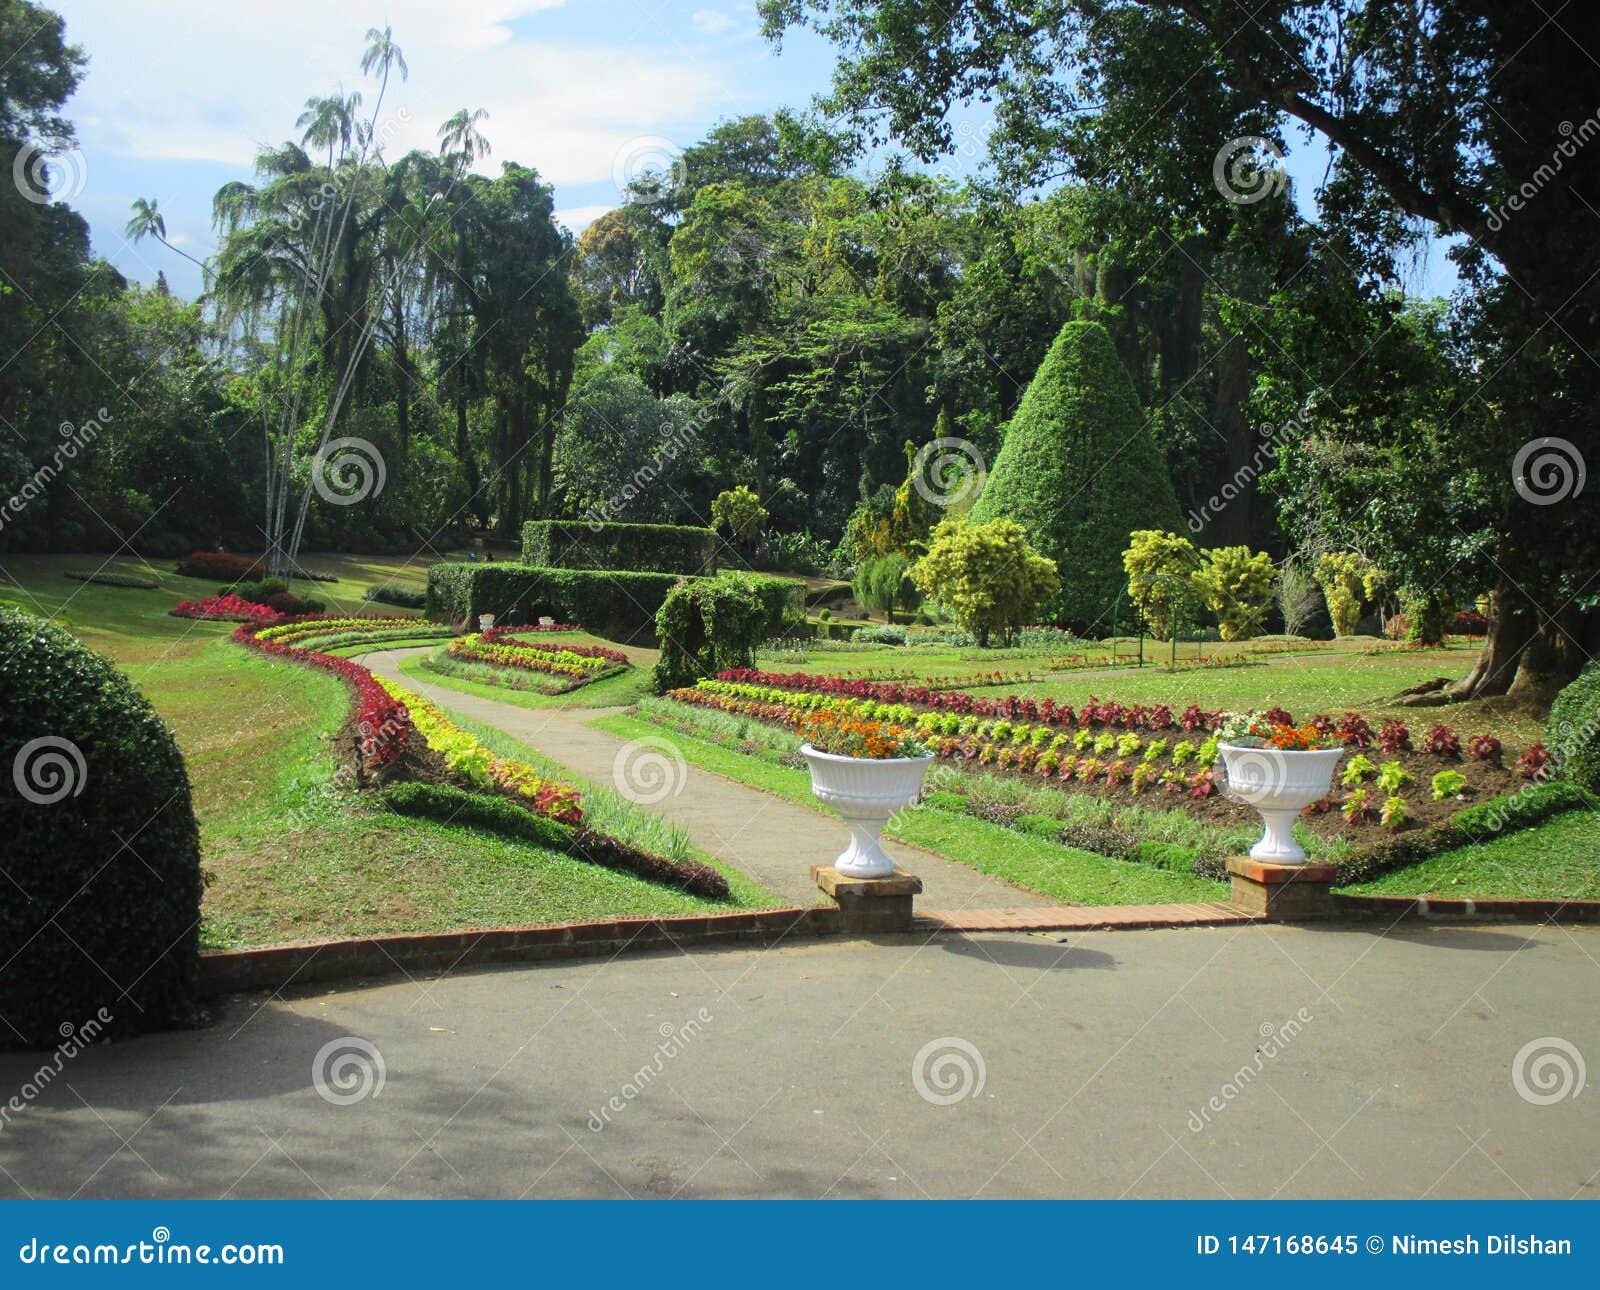 Morning in botanical garden